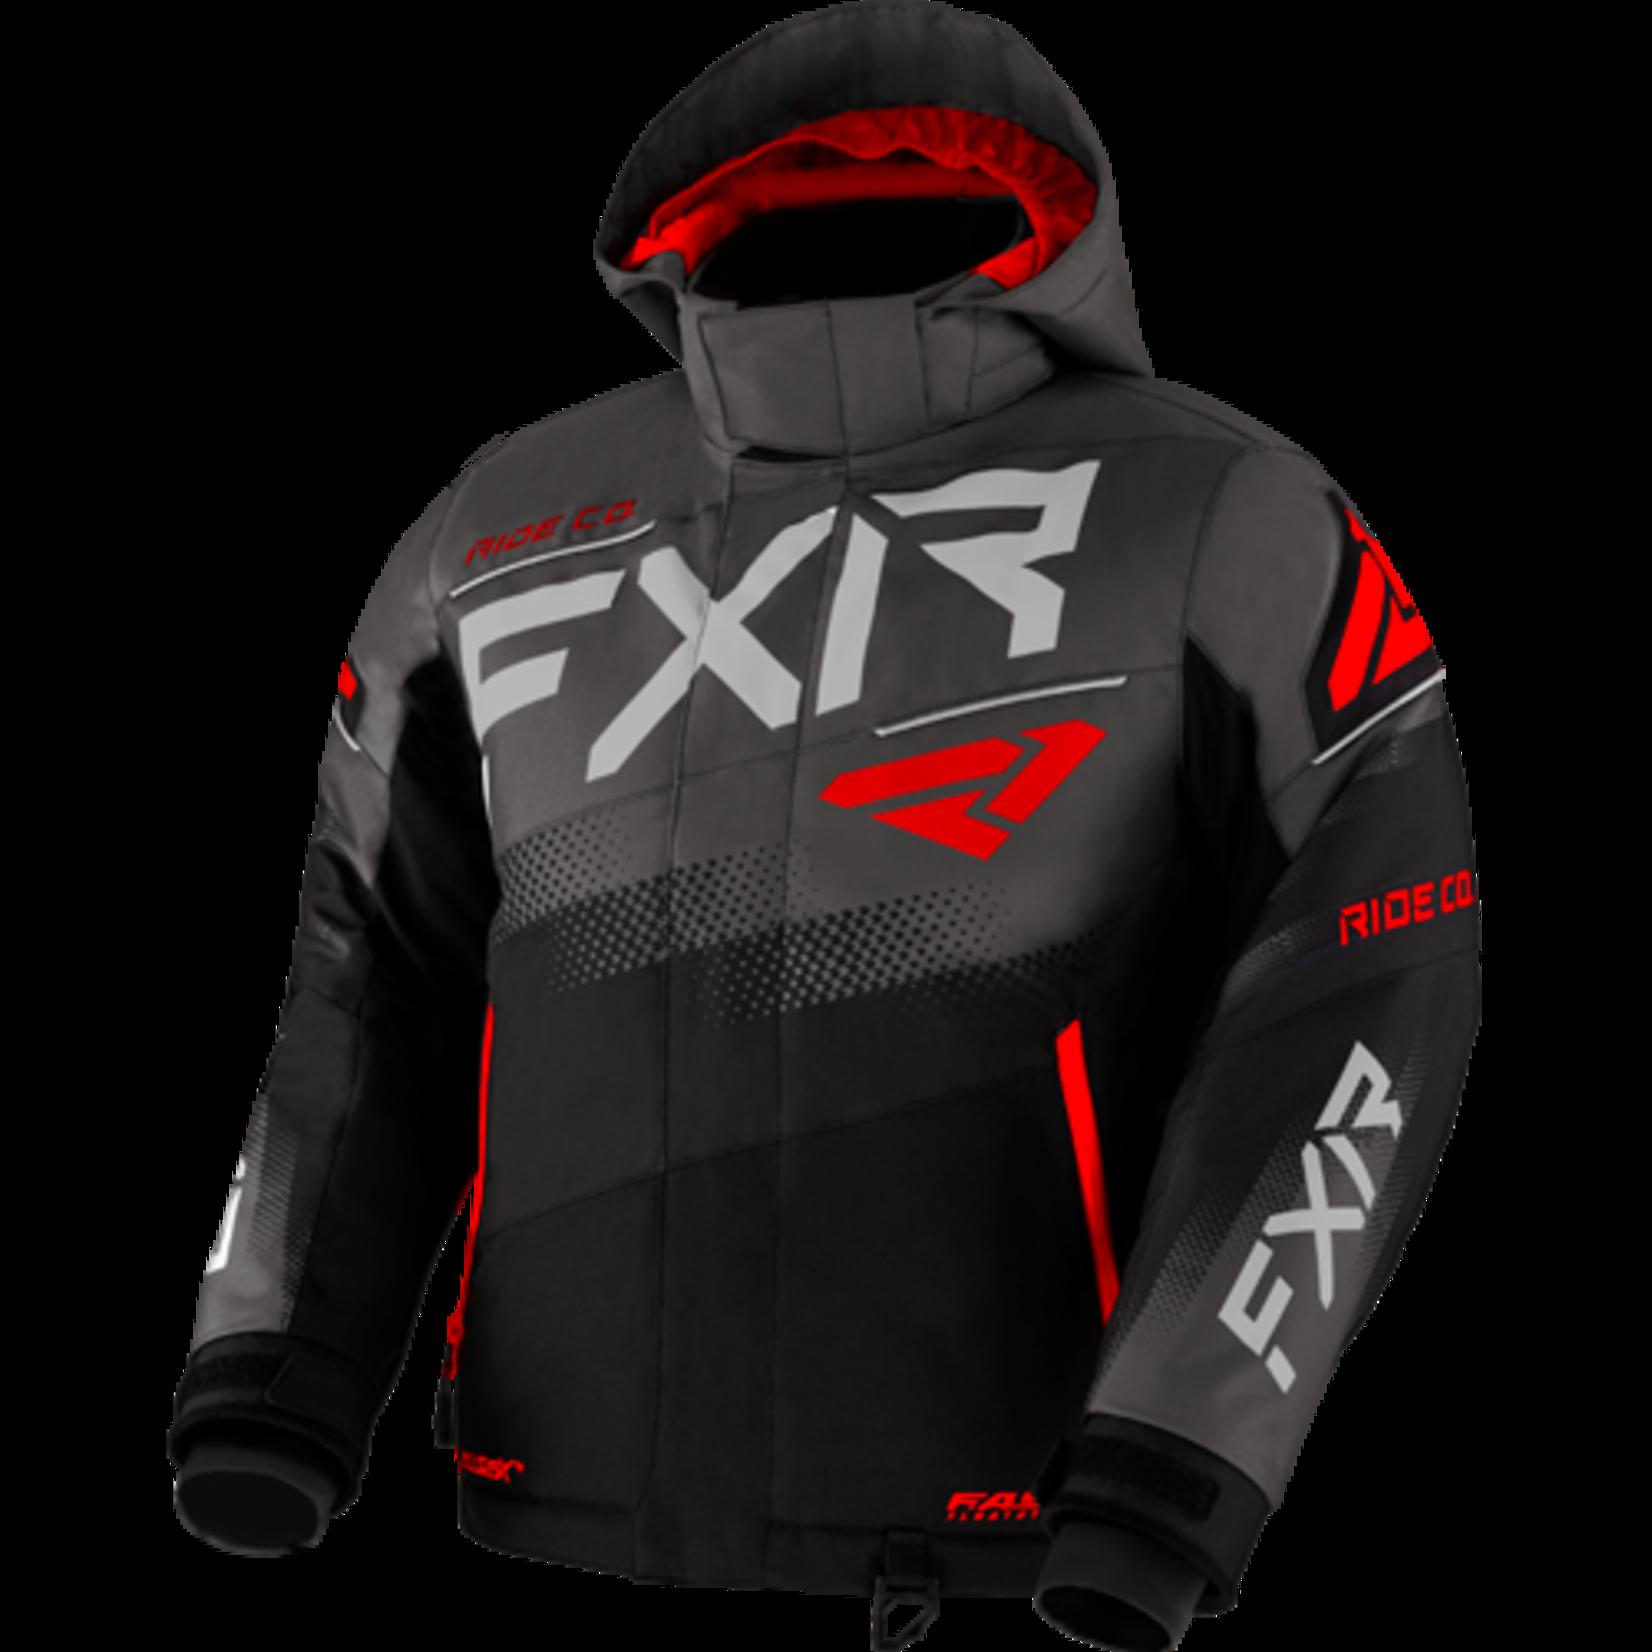 FXR FXR Winter Jacket, Boost, Child, Boys